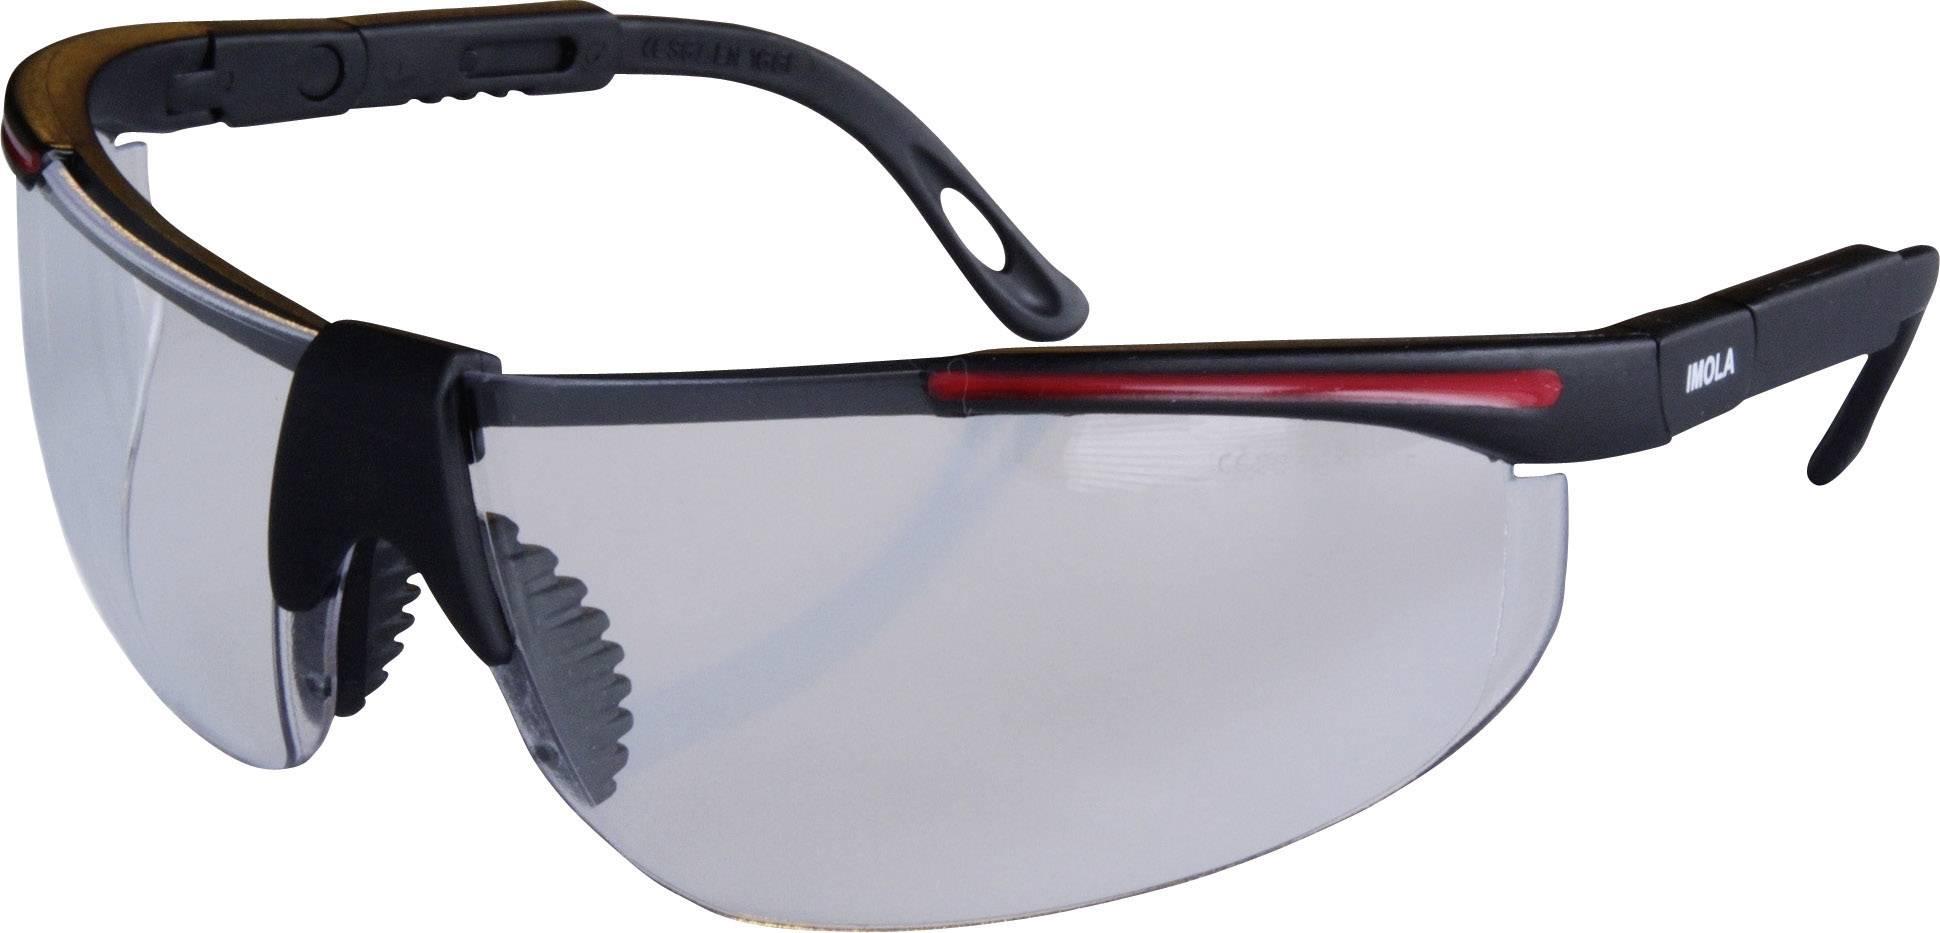 Ochranné okuliare protectionworld 2012007